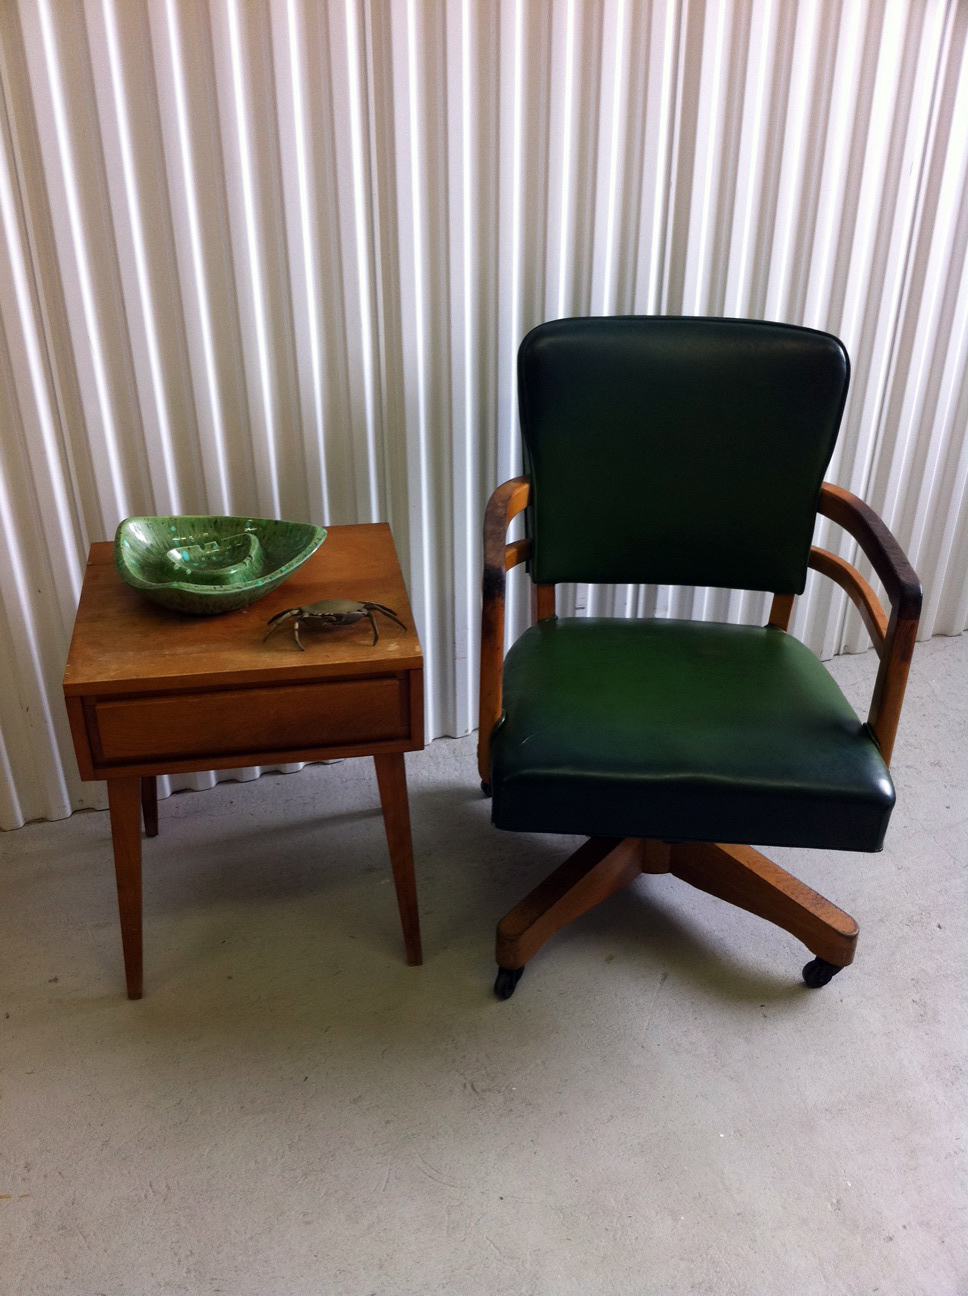 junk2funk: Mid Century Wood Green Desk Chair